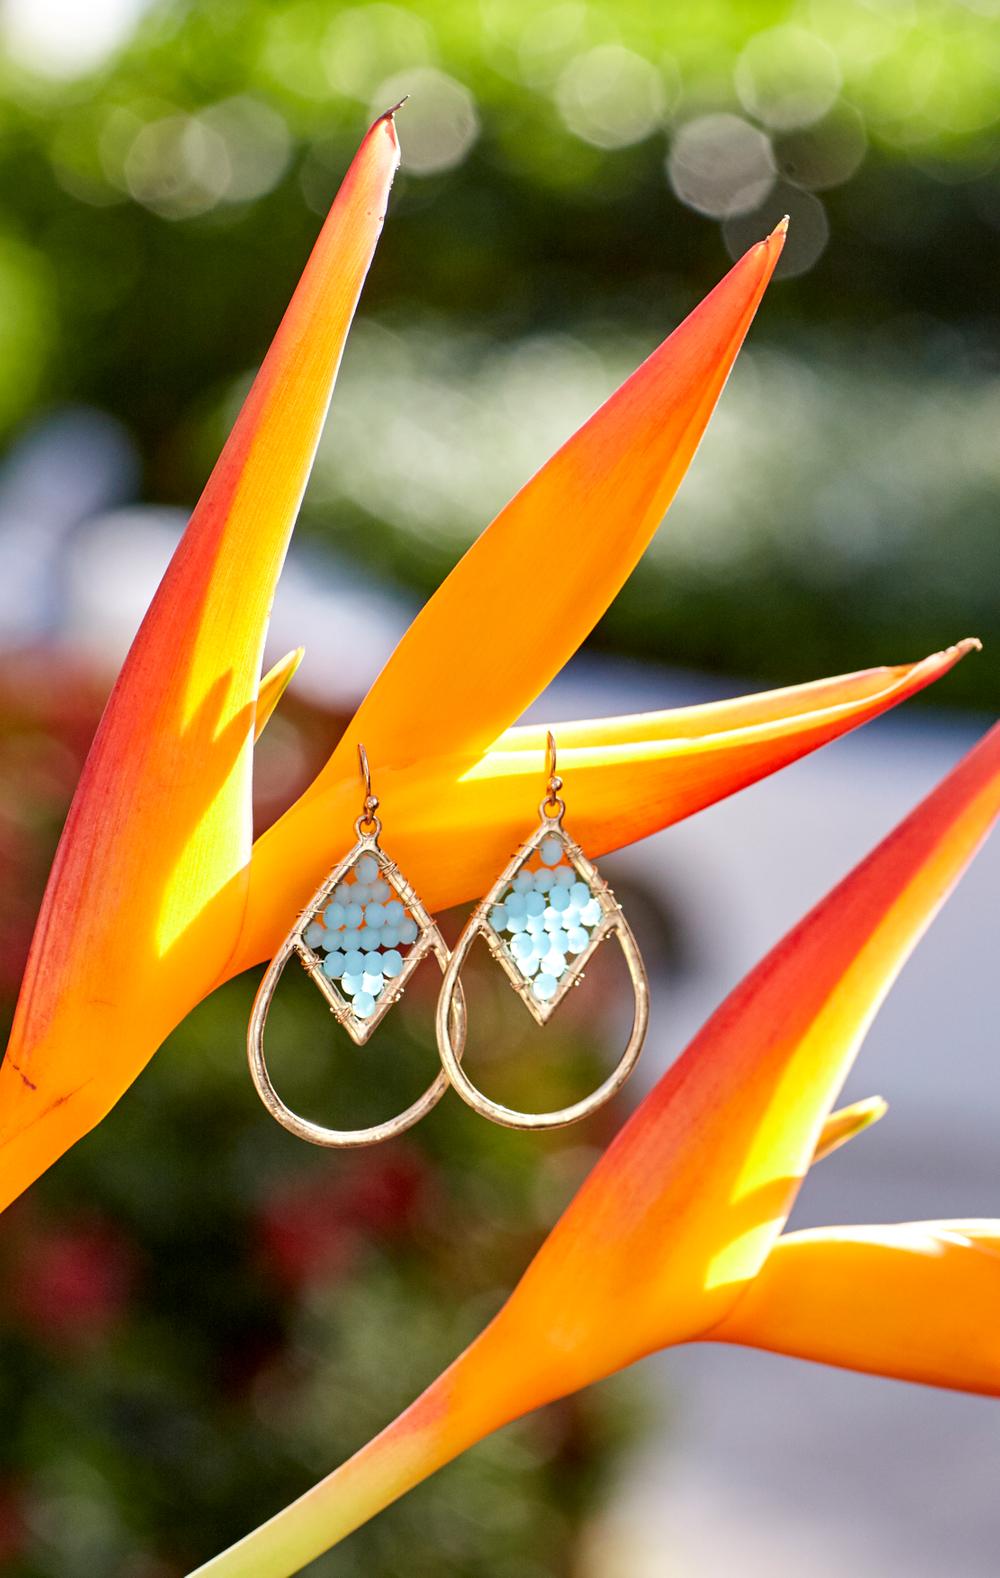 Earrings birds paradise.jpg